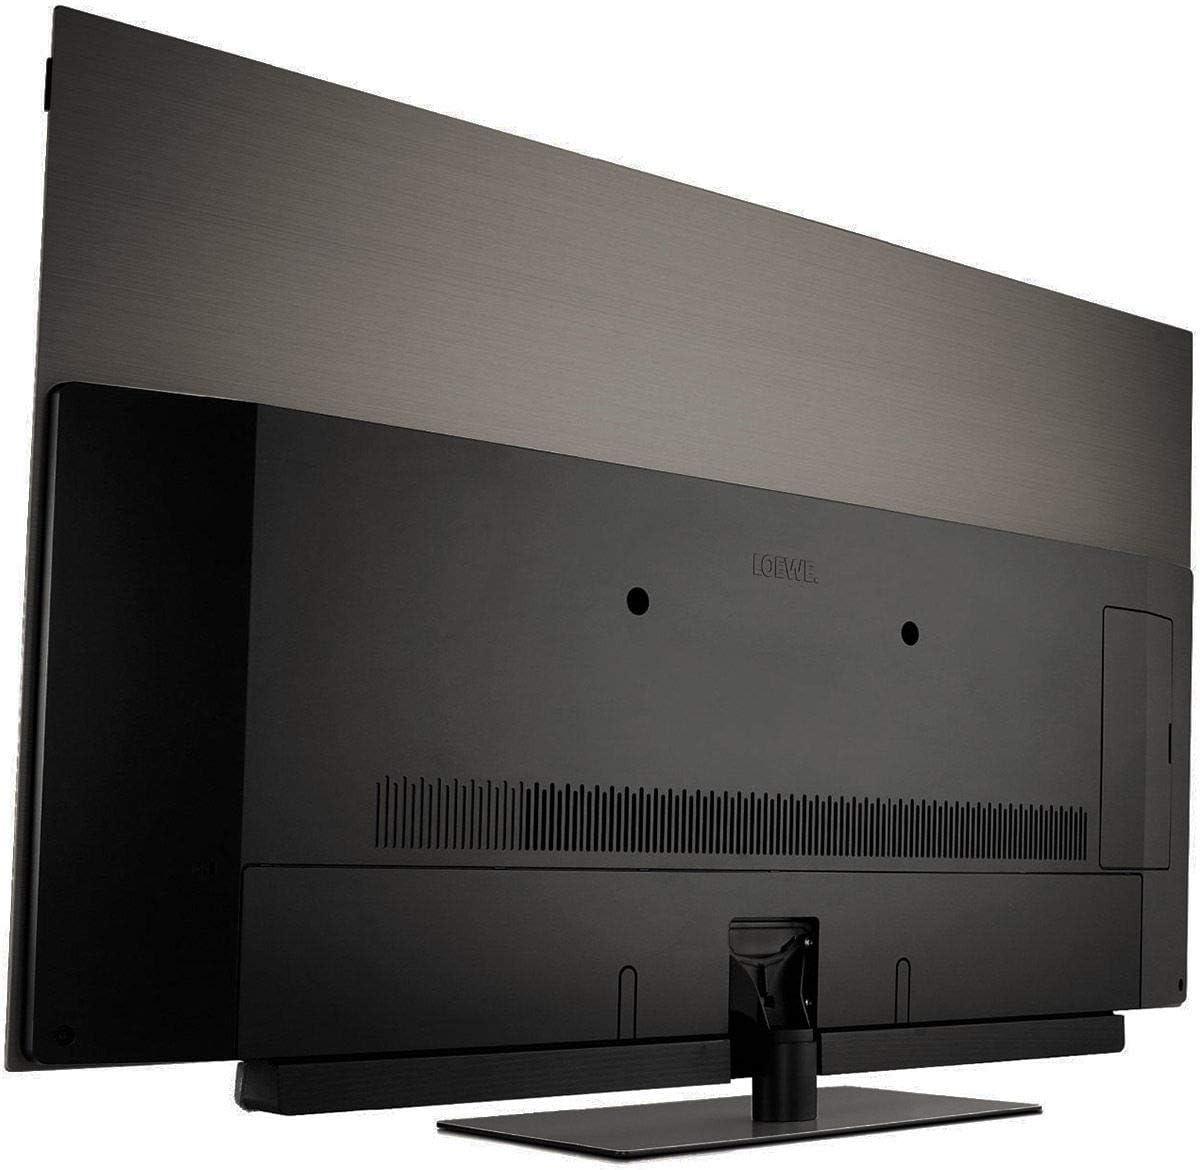 Loewe - TV OLED 55 - Loewe Bild 3.55, Ultra HD 4K, HDR, Smart TV ...